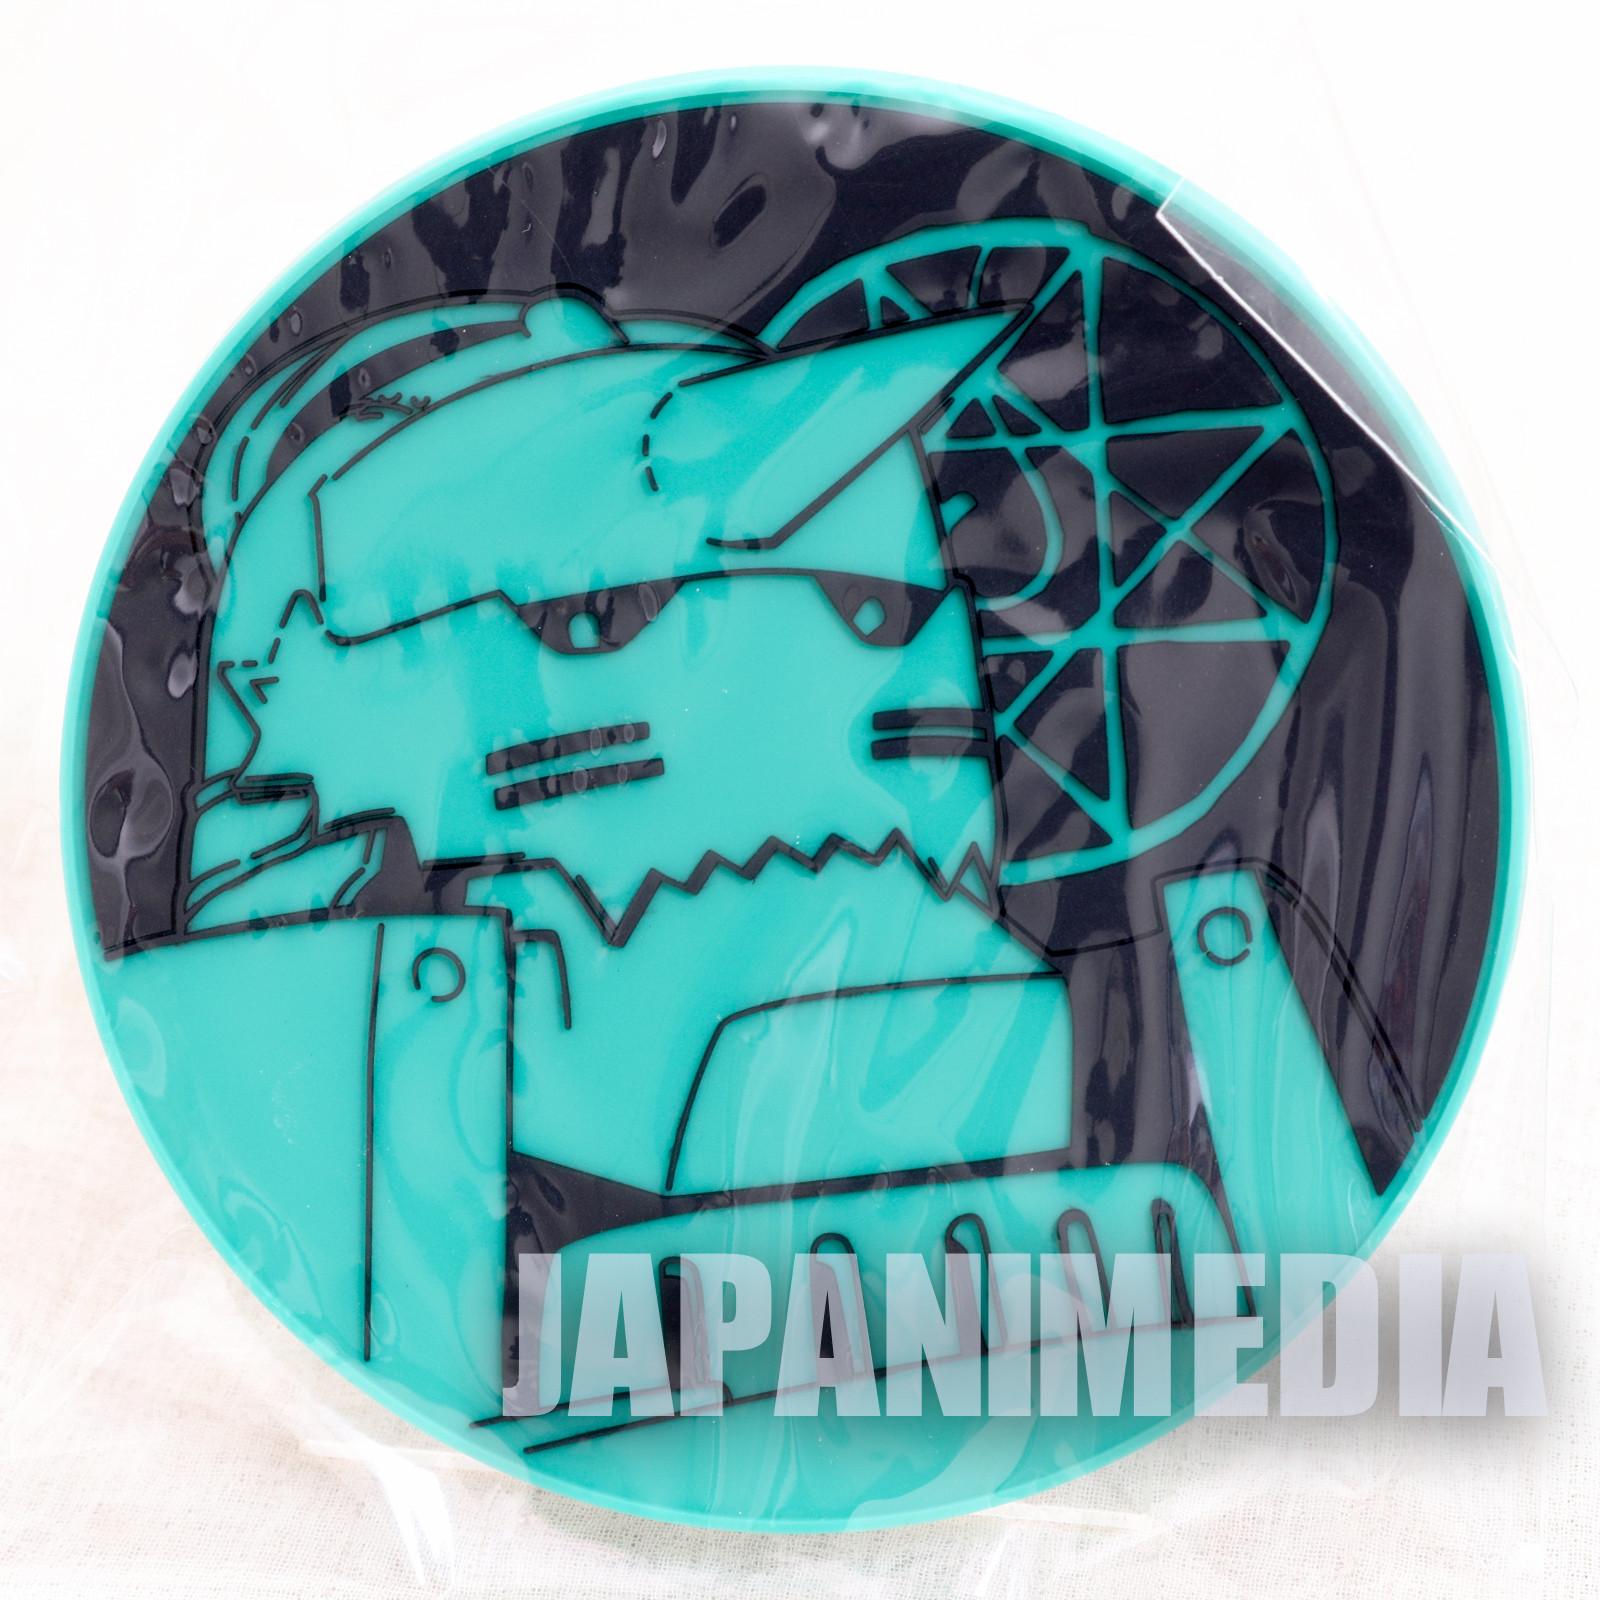 FullMetal Alchemist Alphonse Elric Rubber Coaster JAPAN ANIME